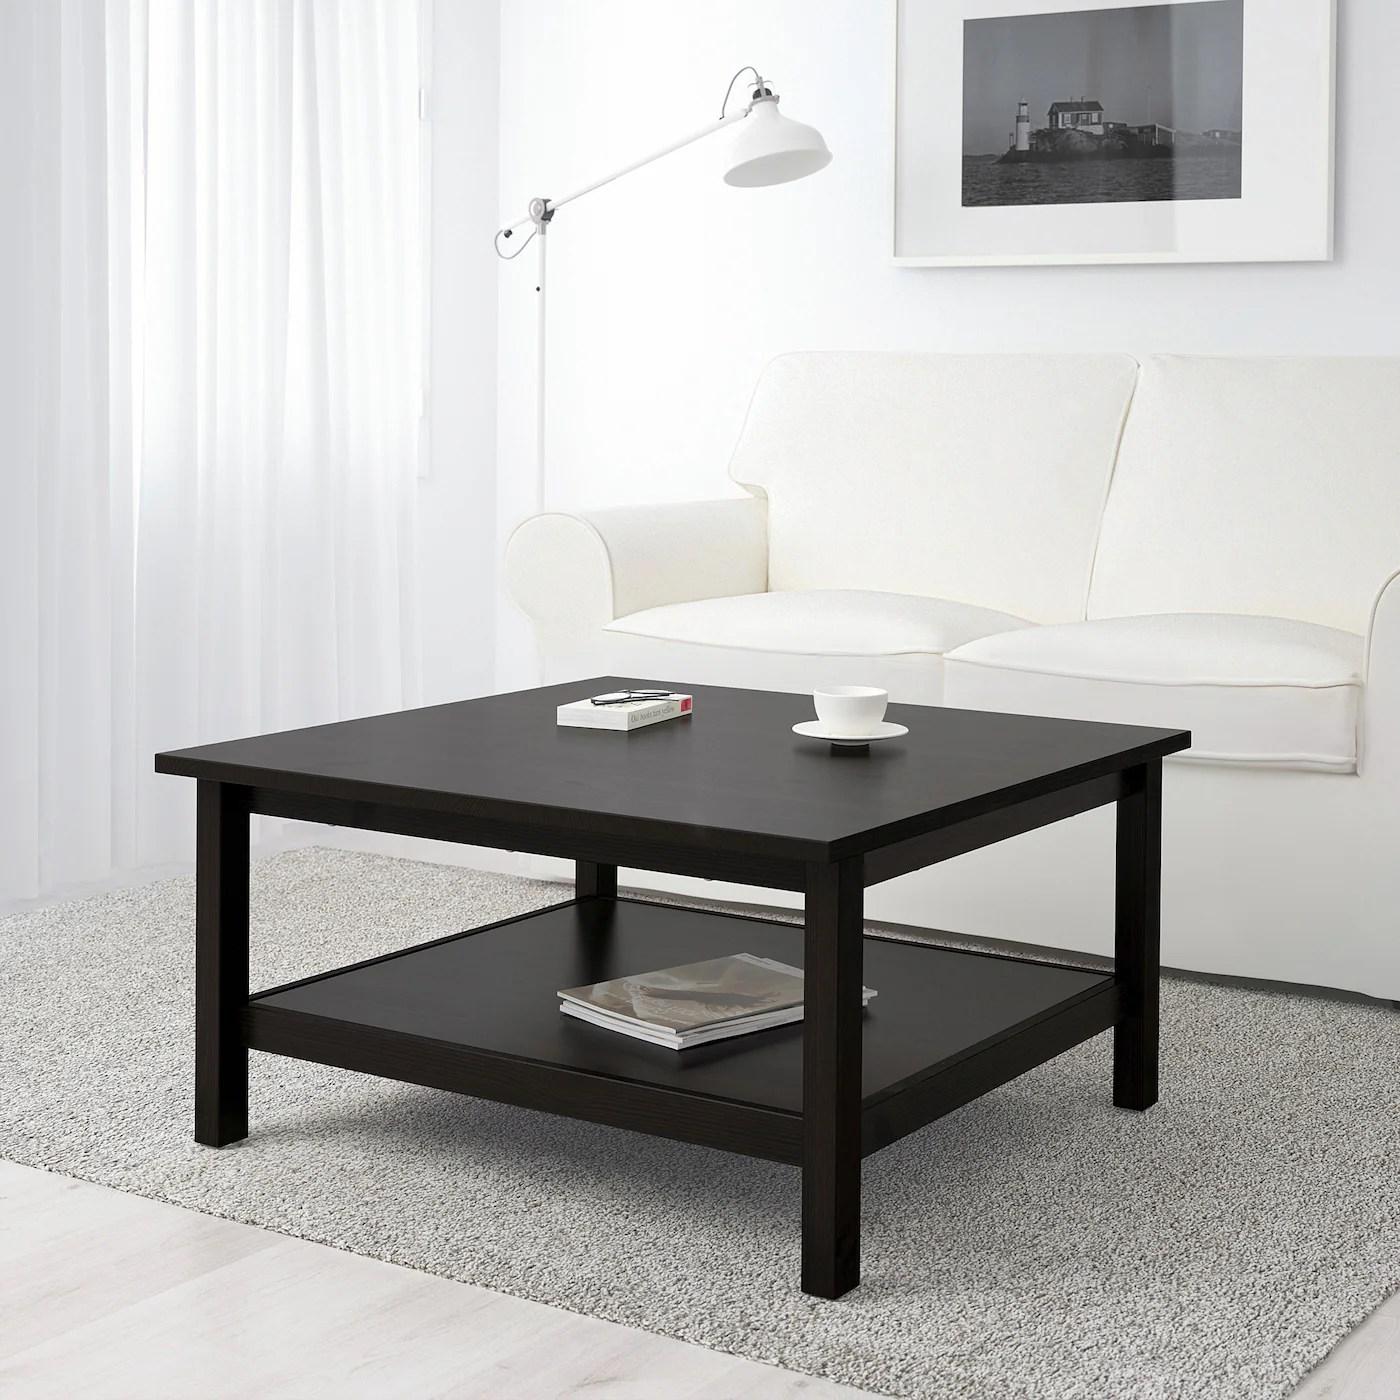 hemnes coffee table black brown 35 3 8x35 3 8